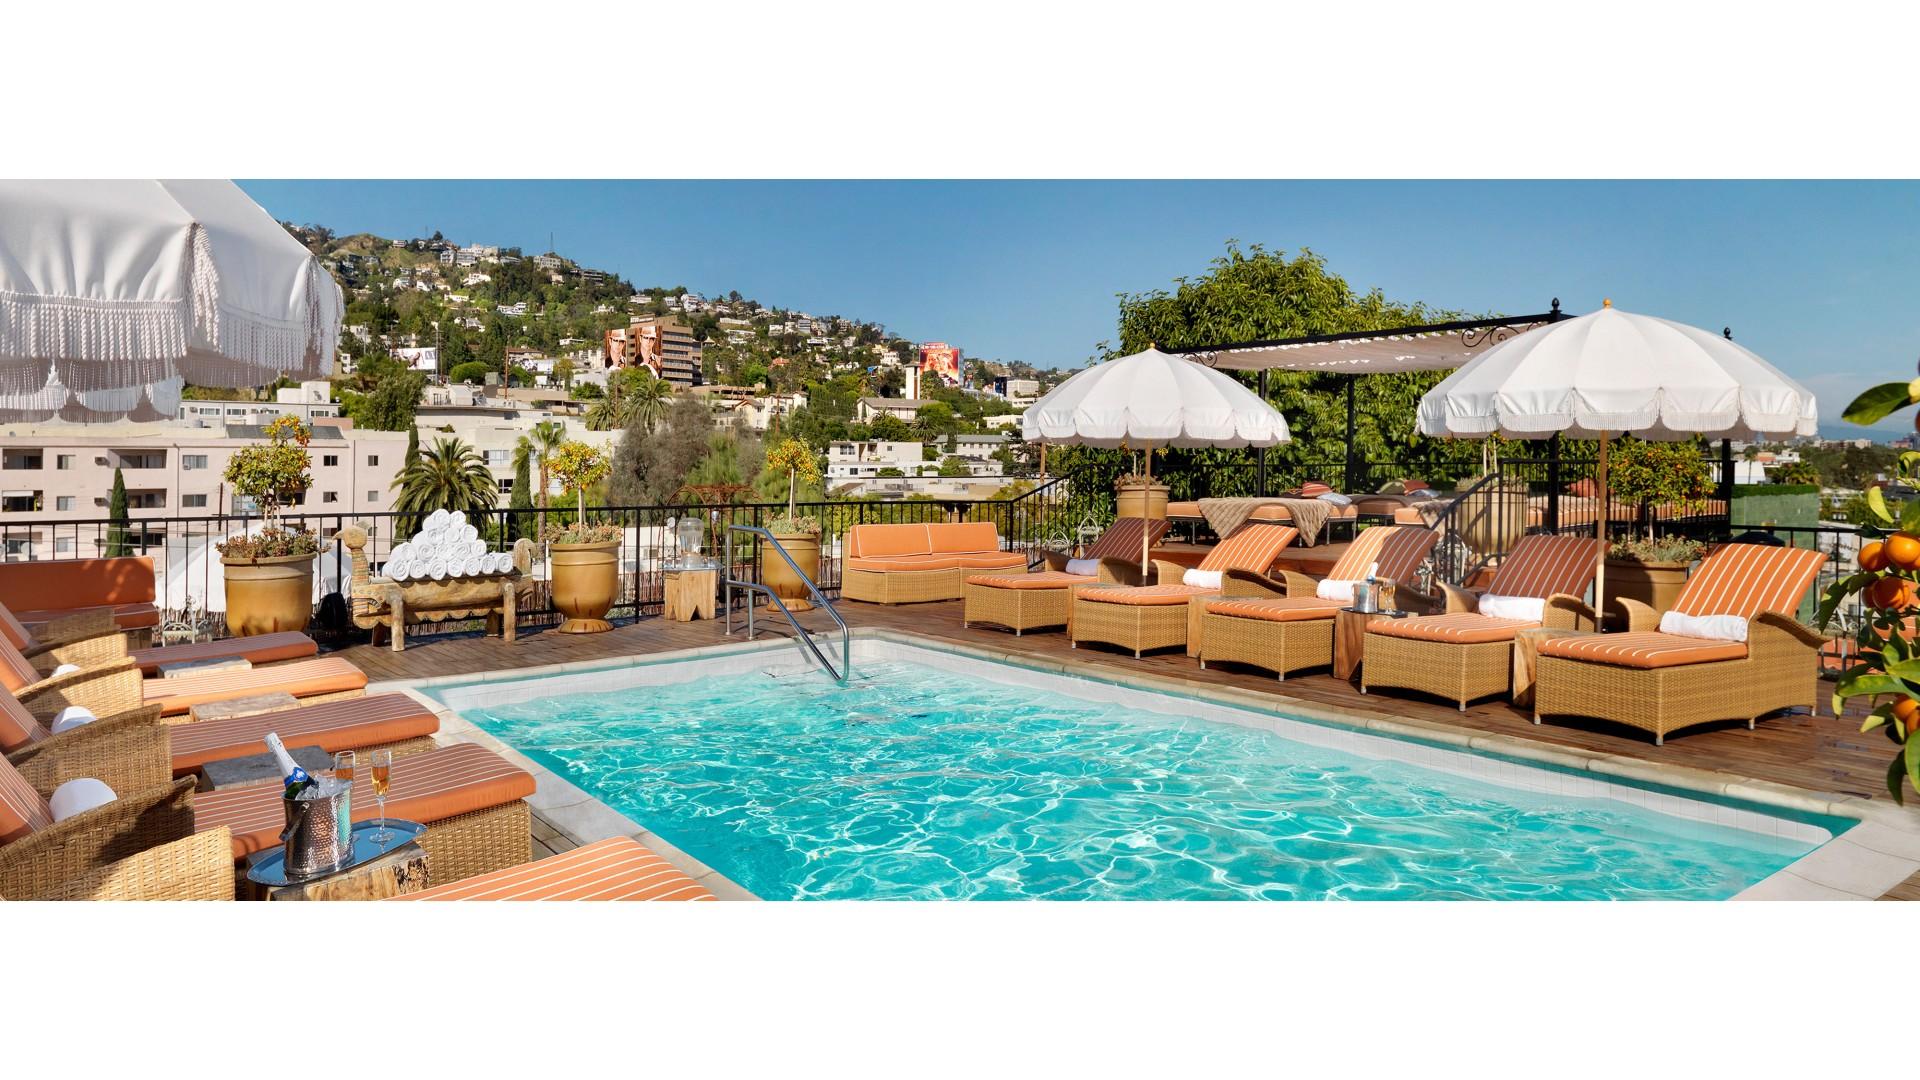 Petit Ermitage hotel West Hollywood Los Angeles California